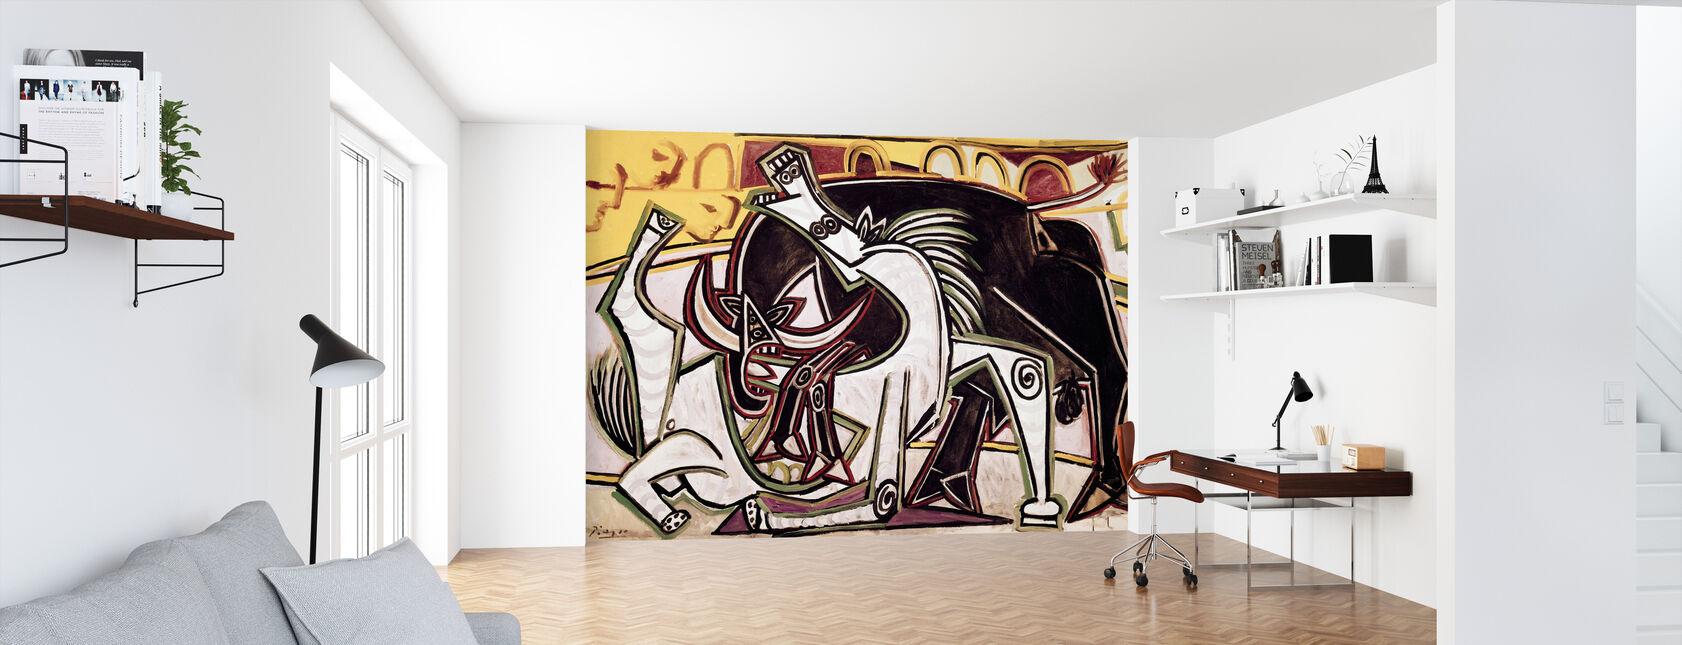 Bullfight - Pablo Picasso - Wallpaper - Office